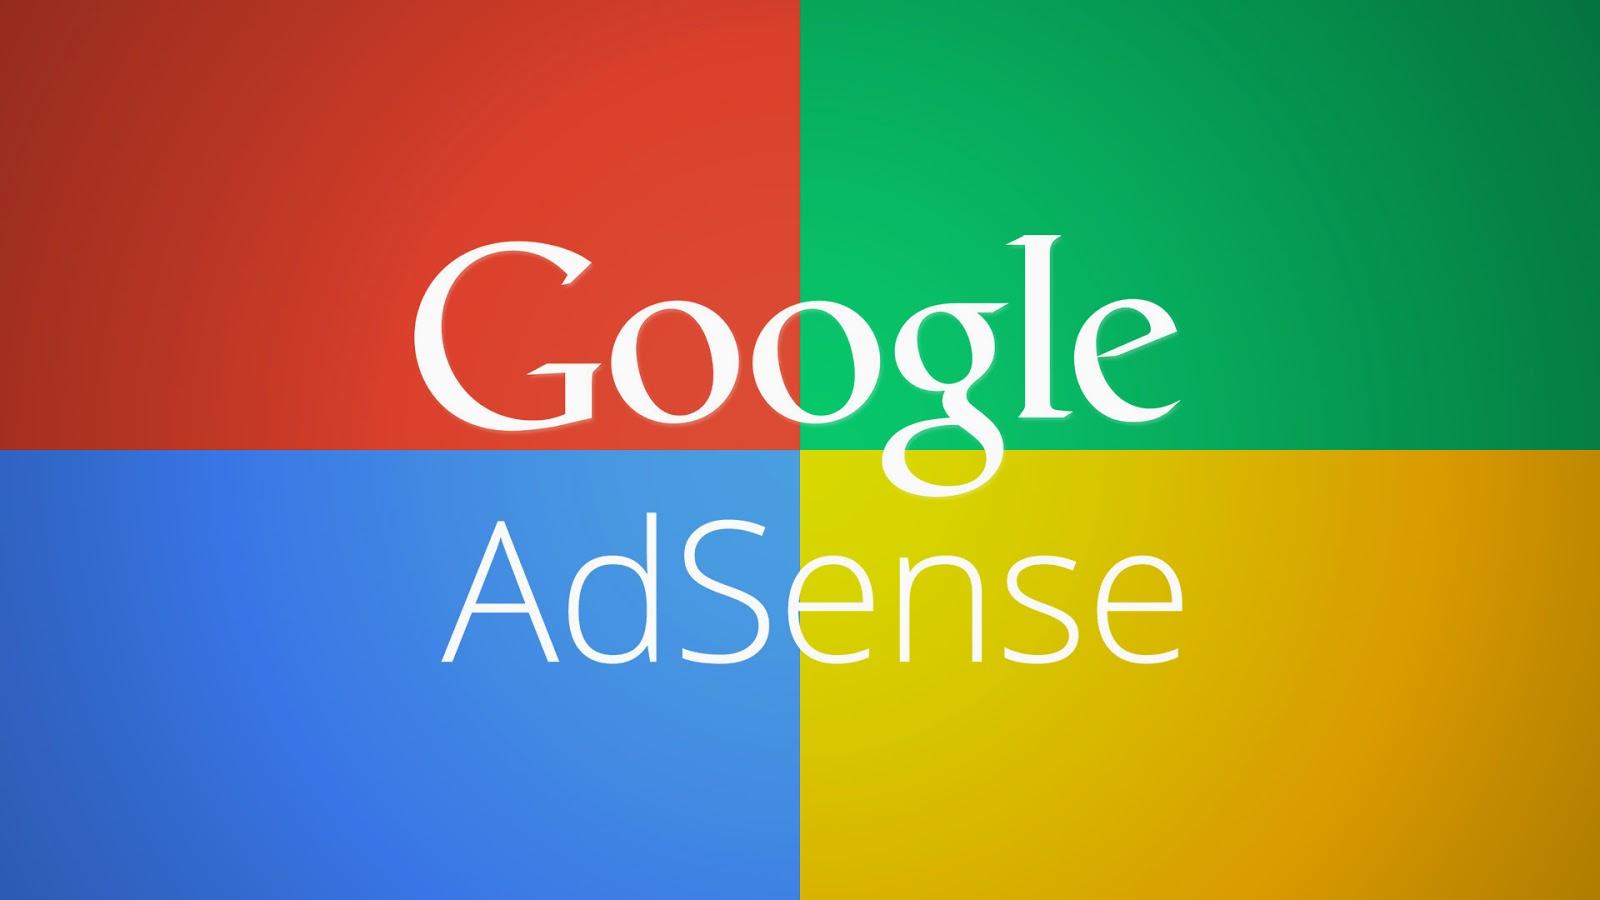 Panduan Belajar AdSense (Google AdSense) Lengkap